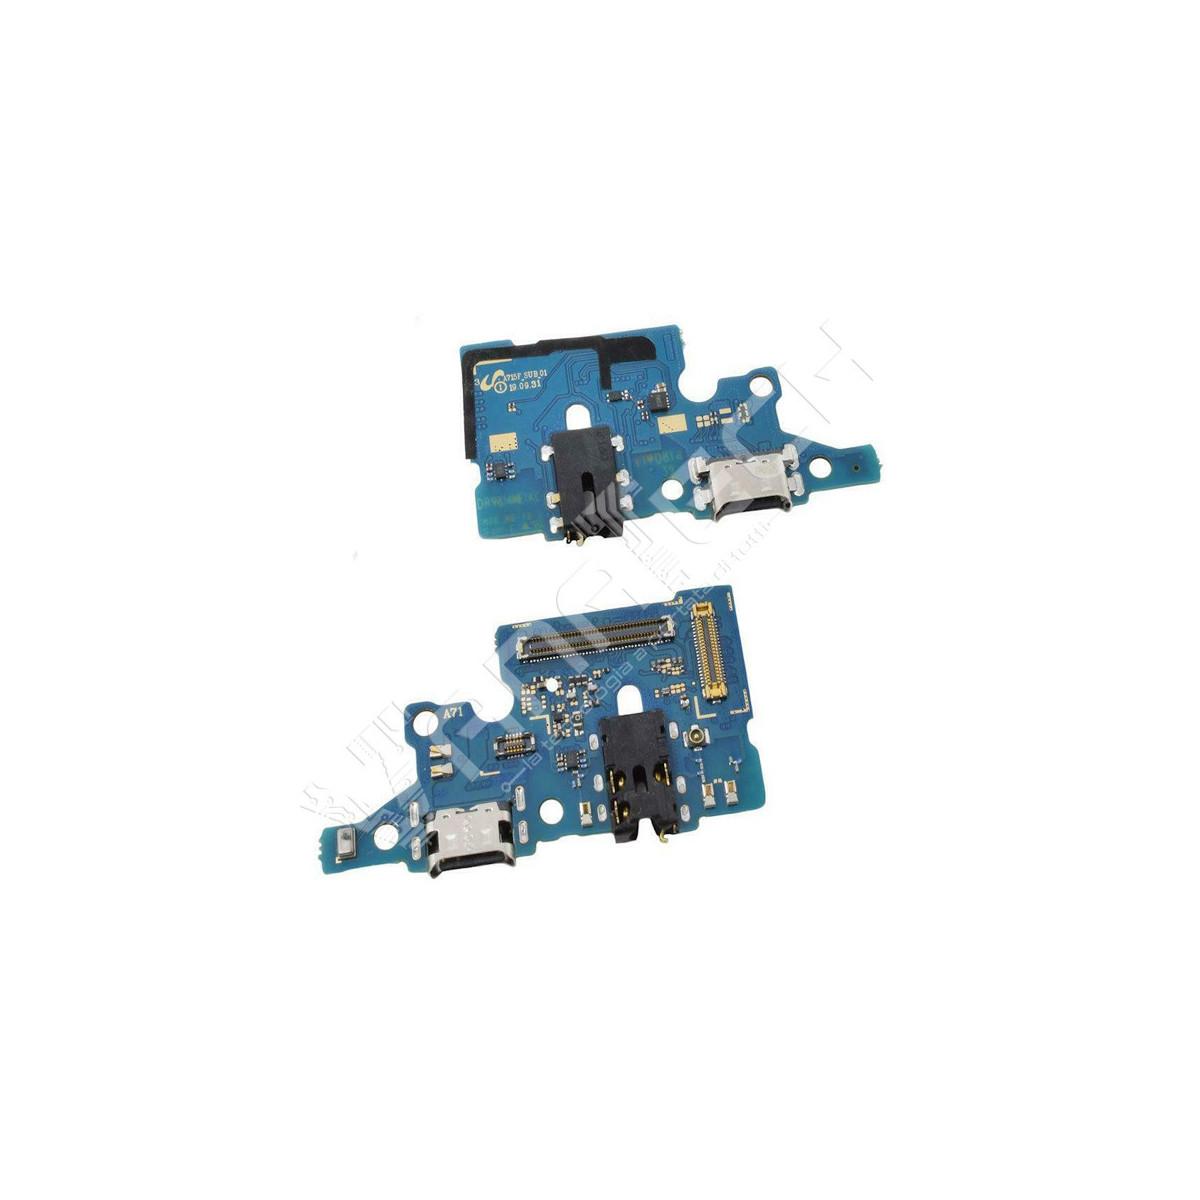 PC DESKTOP COMPLETO CPU INTEL G3900 4GB RAM DDR4 2400MHz 1TB 1000GB HARD DISK